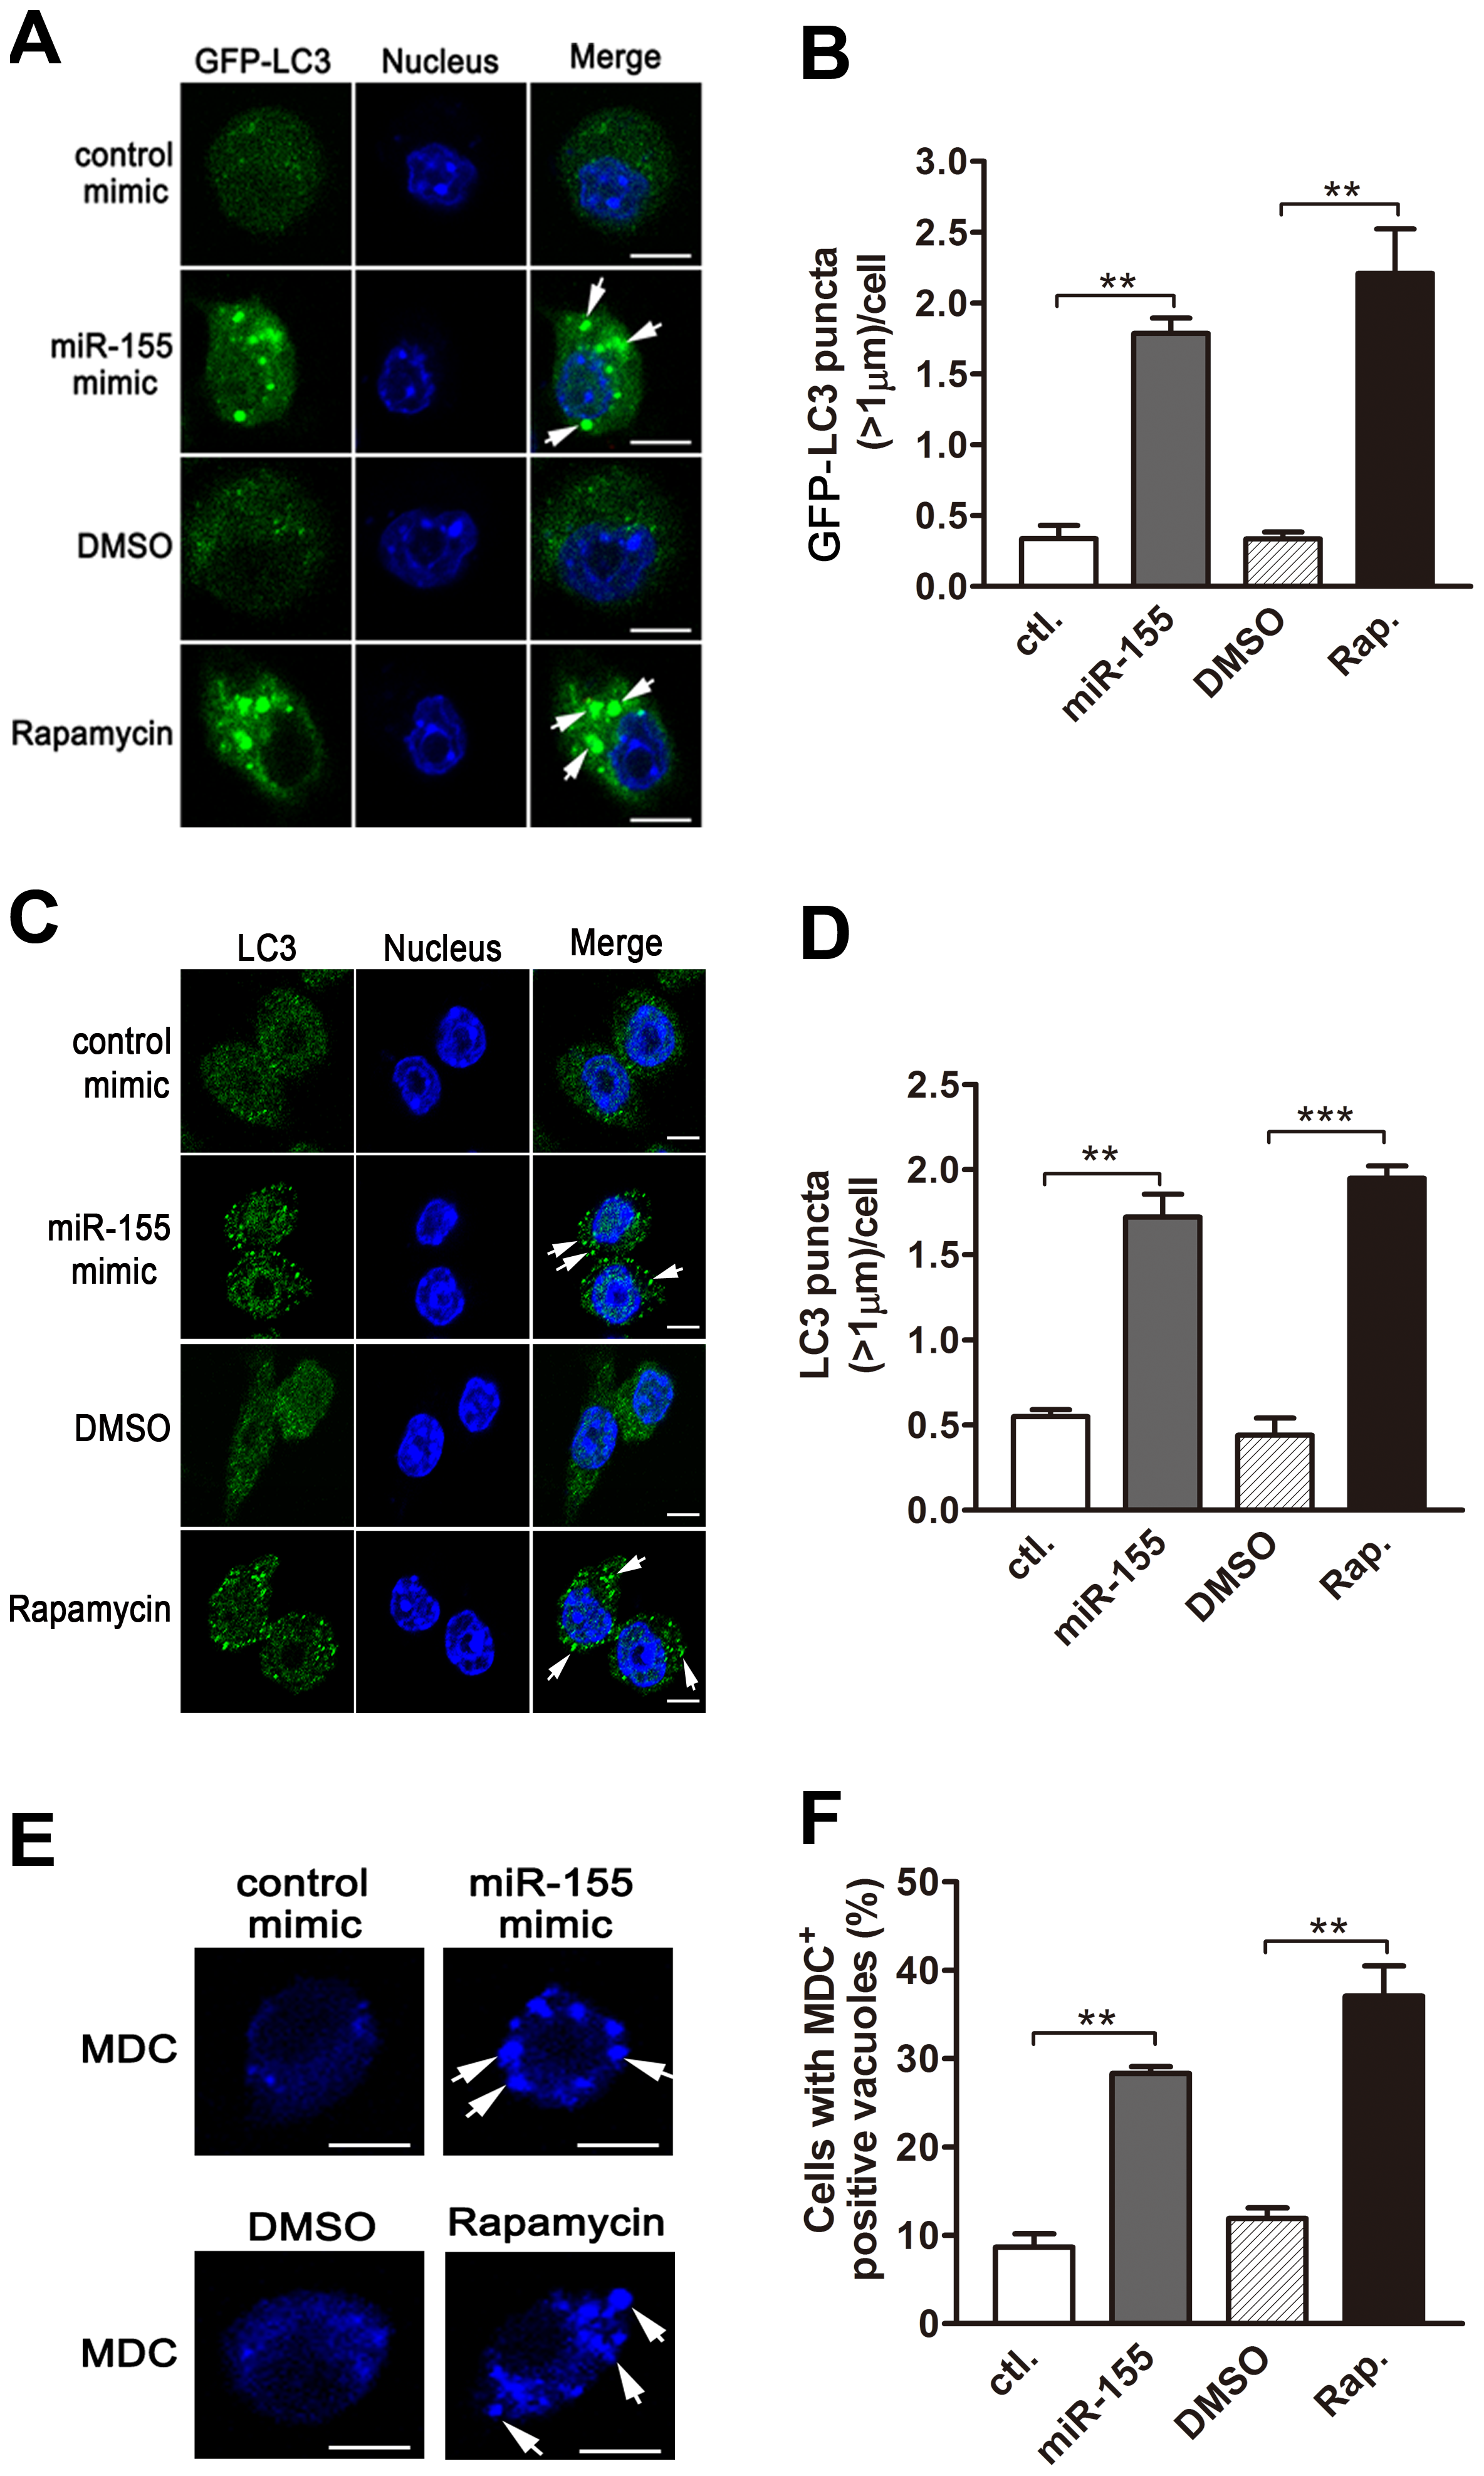 miR-155 promotes autophagosome formation.